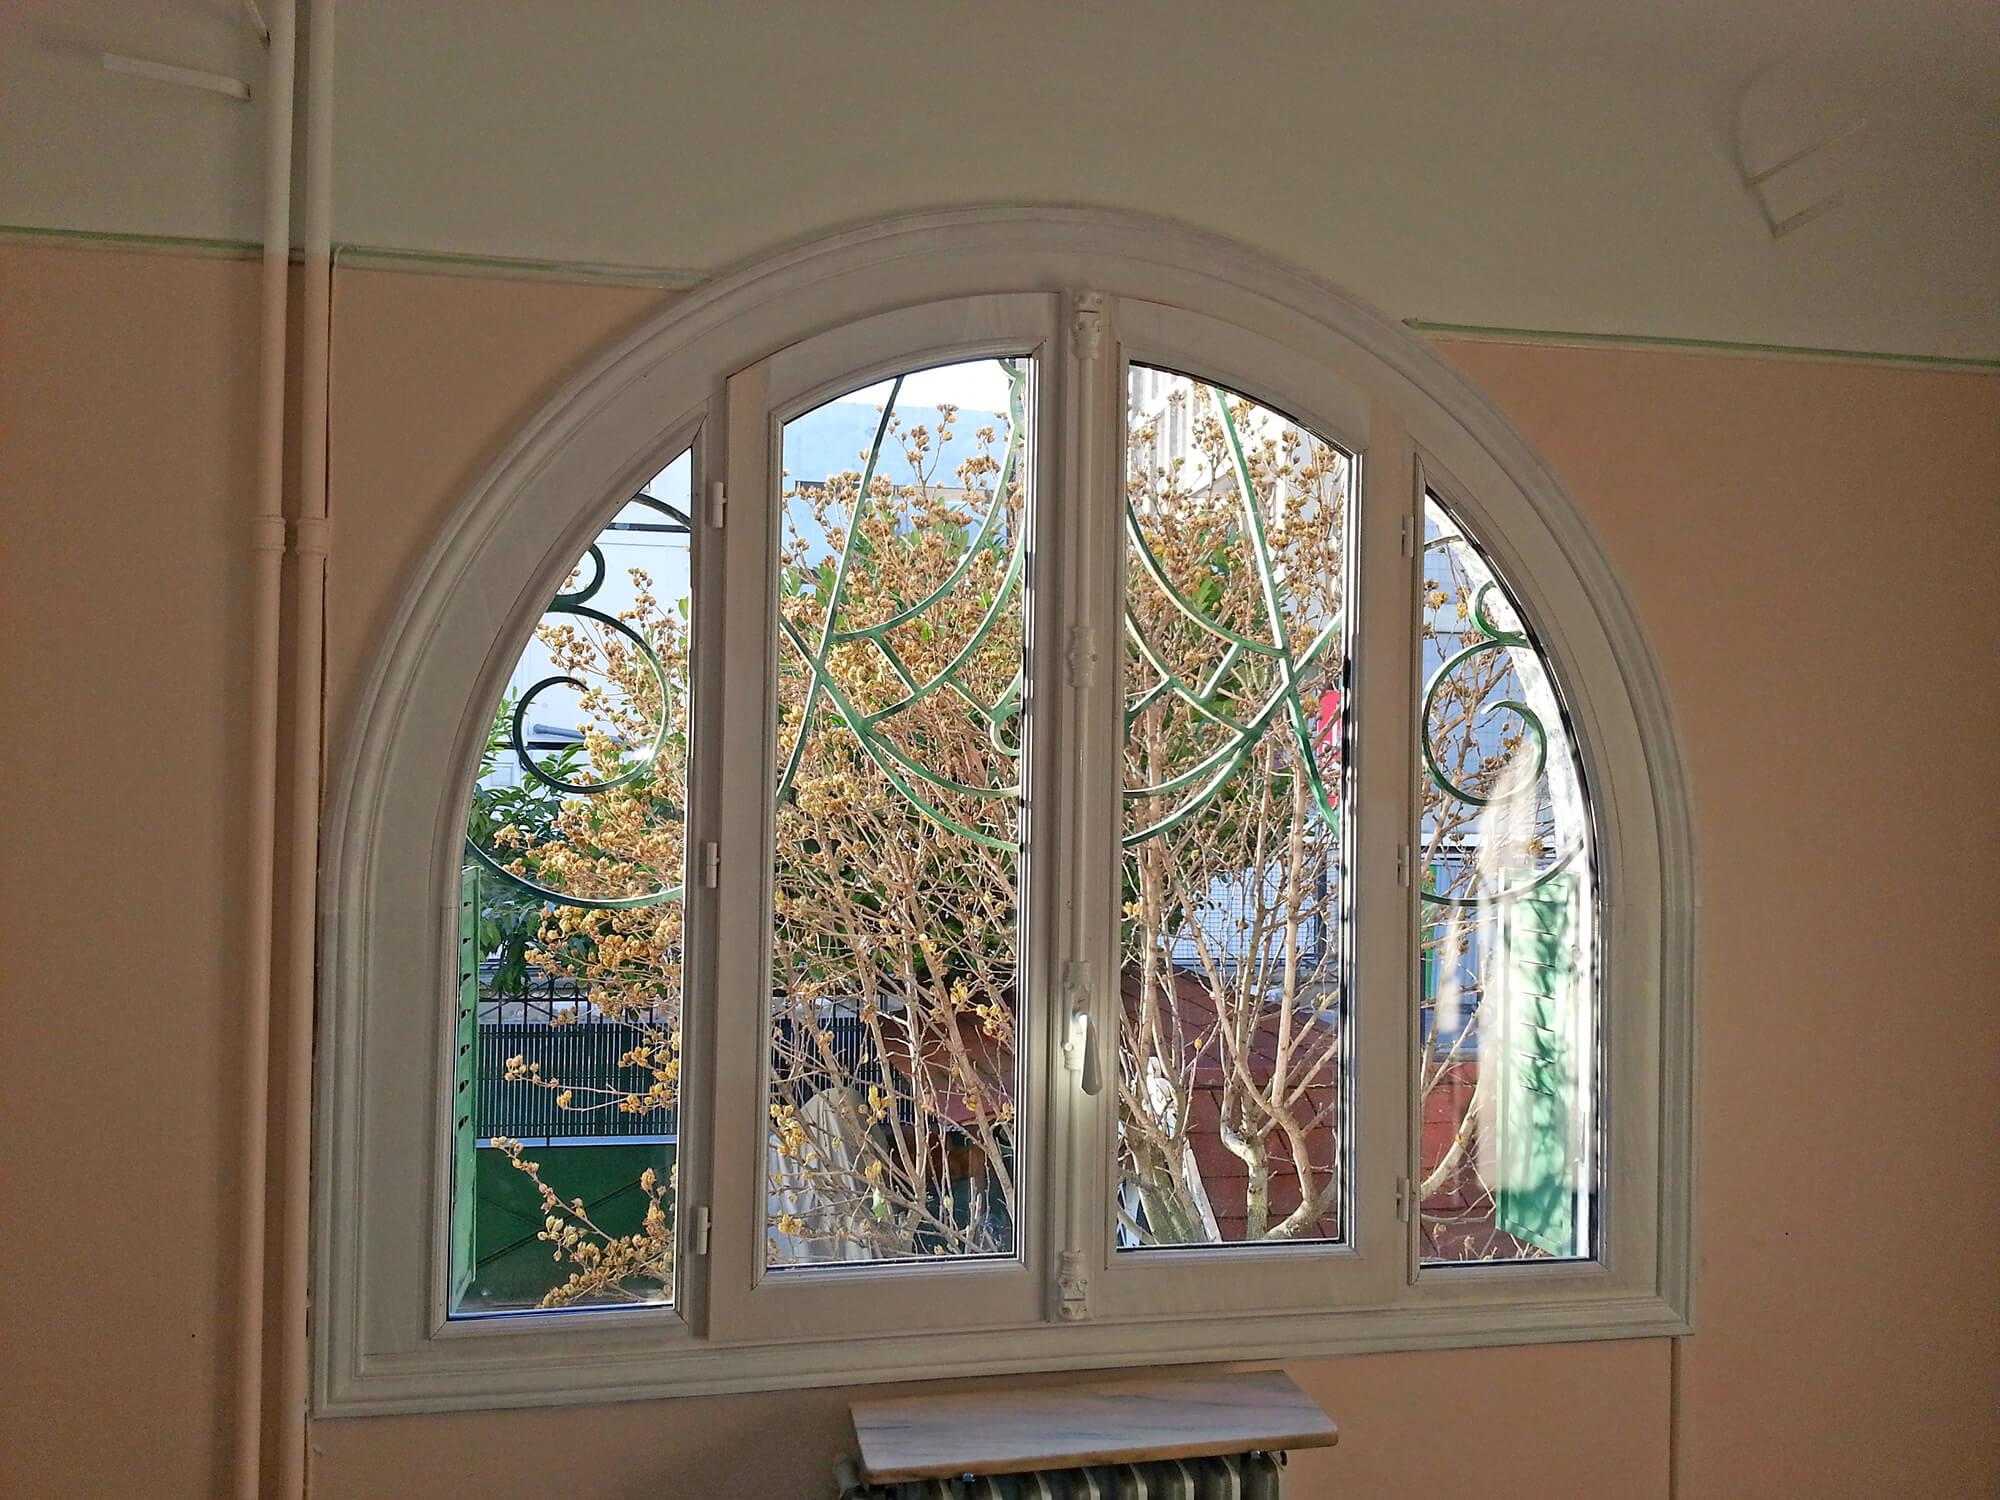 r alisation de fen tre en bois blanche et grille en fer forg pos e bois colombes 92. Black Bedroom Furniture Sets. Home Design Ideas